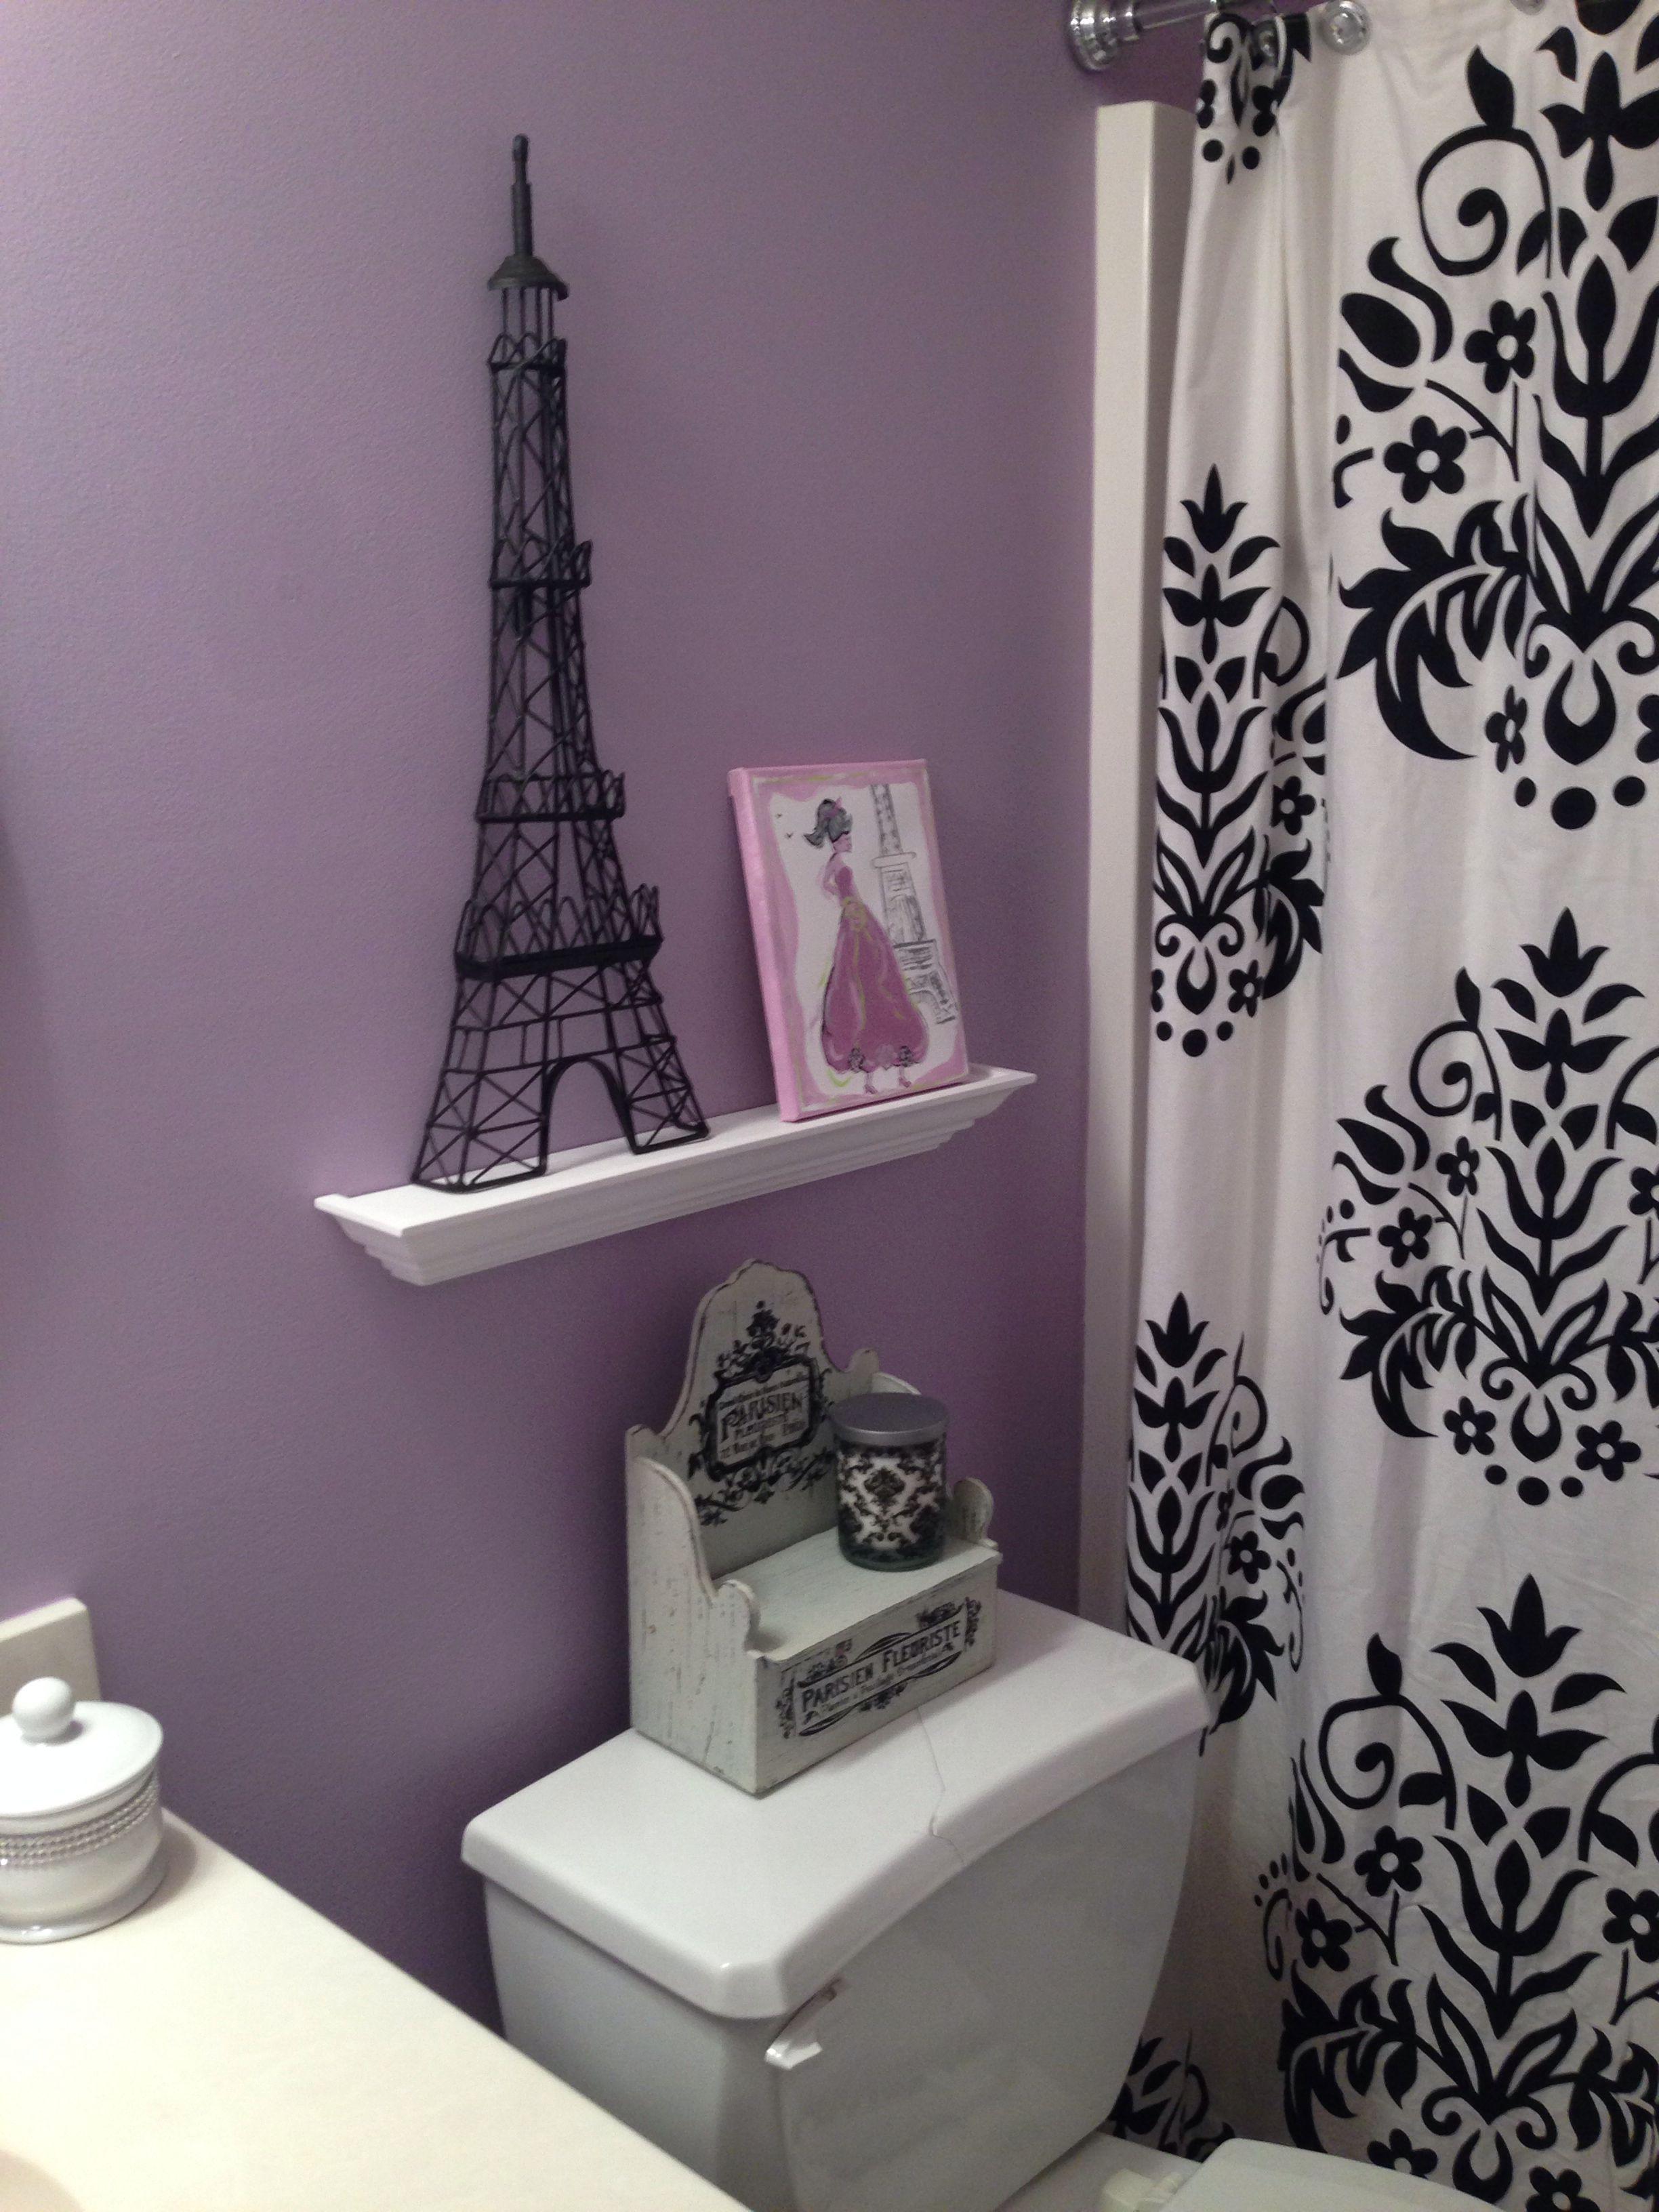 Pin By Terri Harr On Paris Theme Bathroom Paris Bathroom Decor Paris Theme Bathroom Bathroom Decor